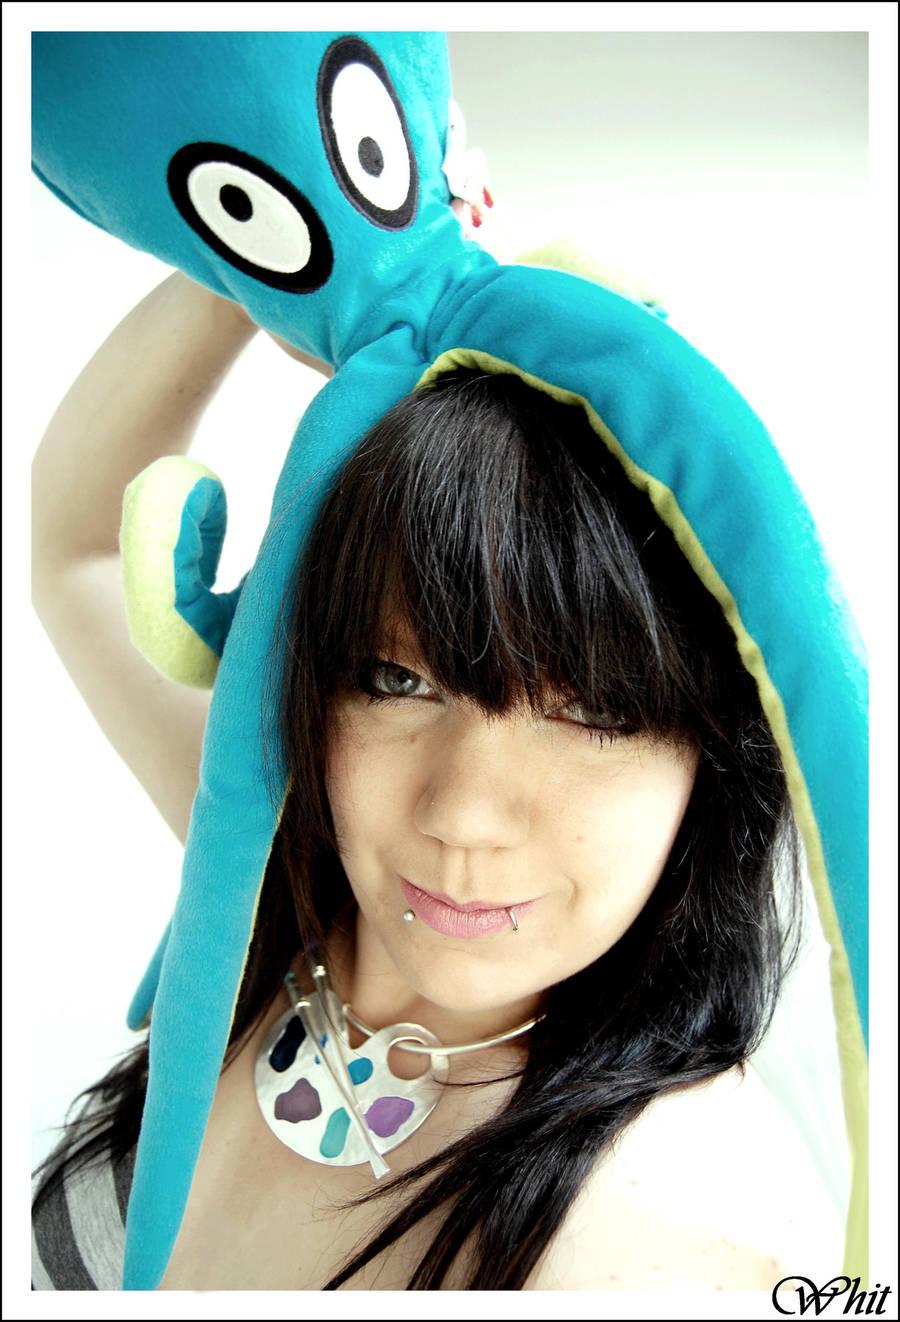 Princess-Whit's Profile Picture